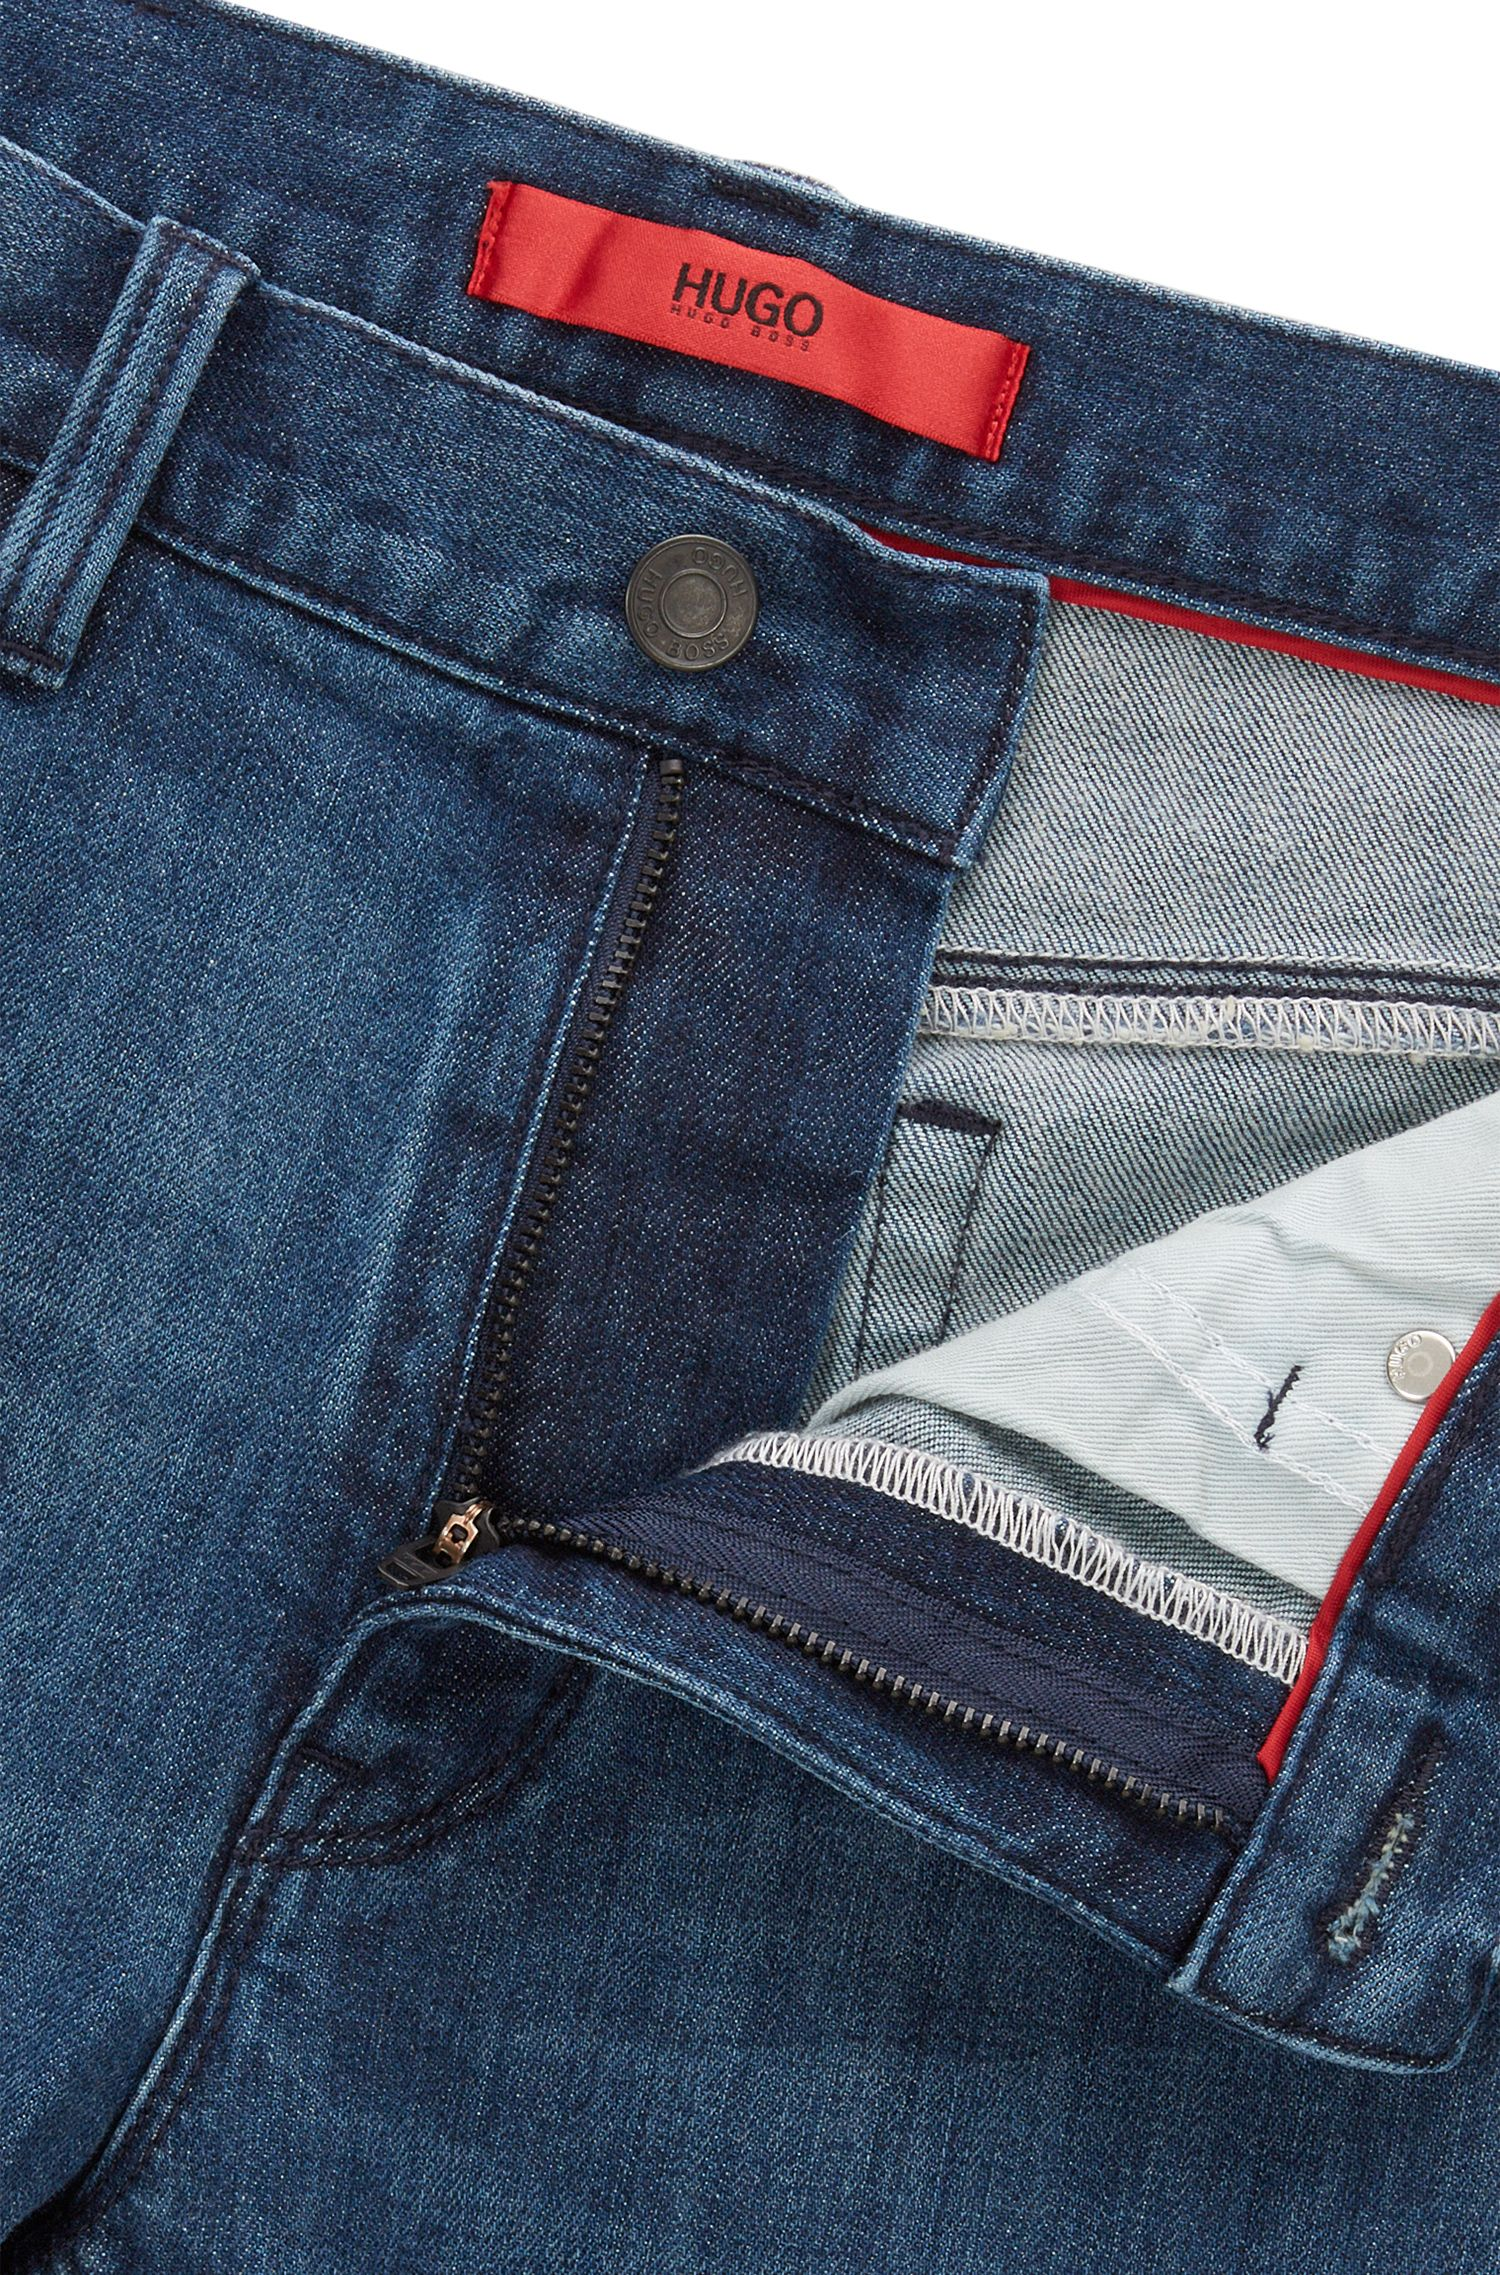 Stretch Cotton Blend Jeans, Slim Fit | HUGO 708